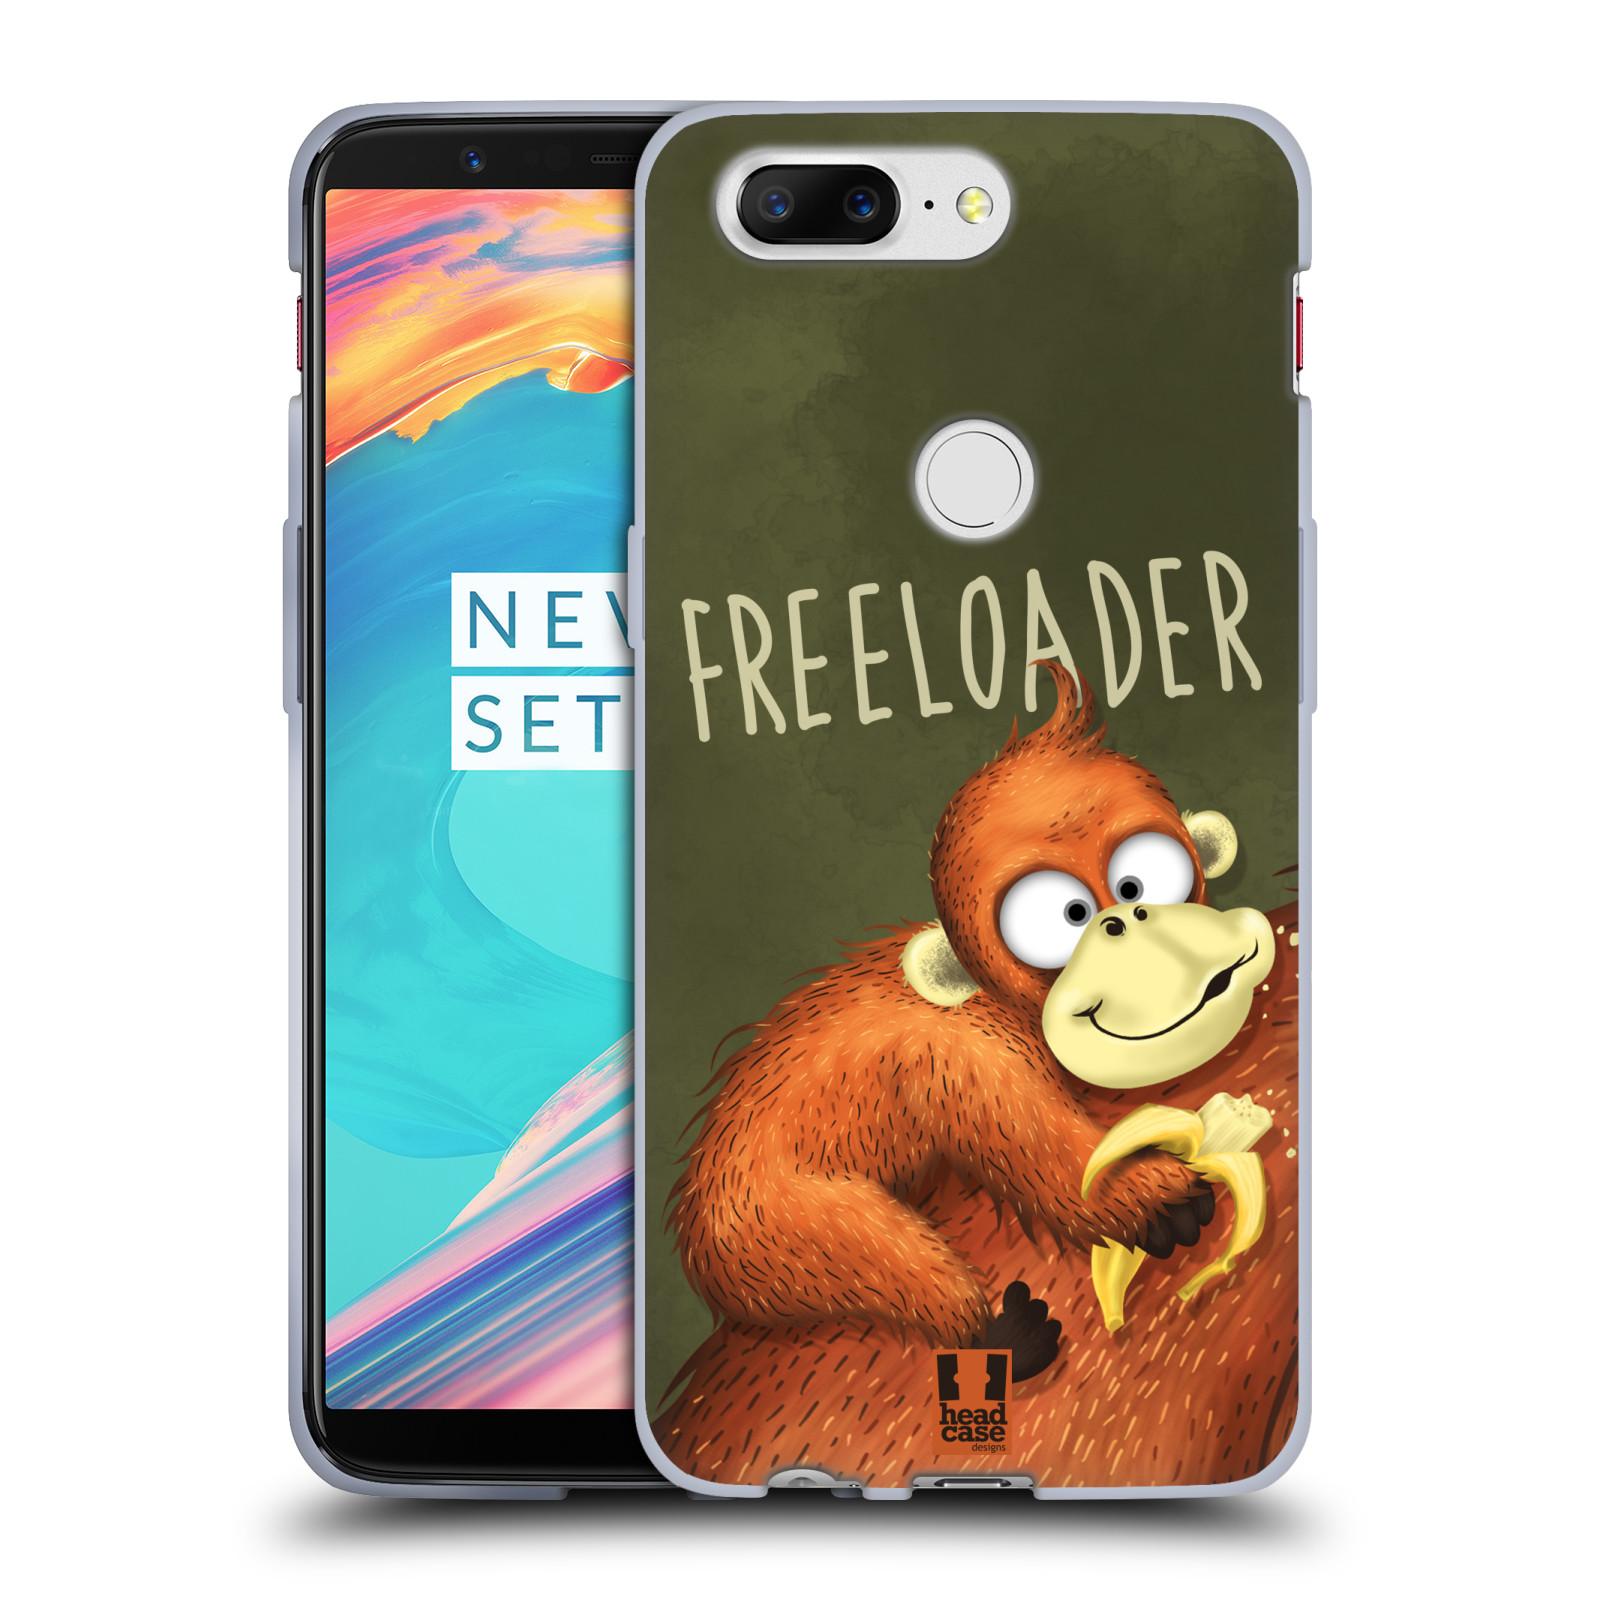 Silikonové pouzdro na mobil OnePlus 5T - Head Case - Opičák Freeloader